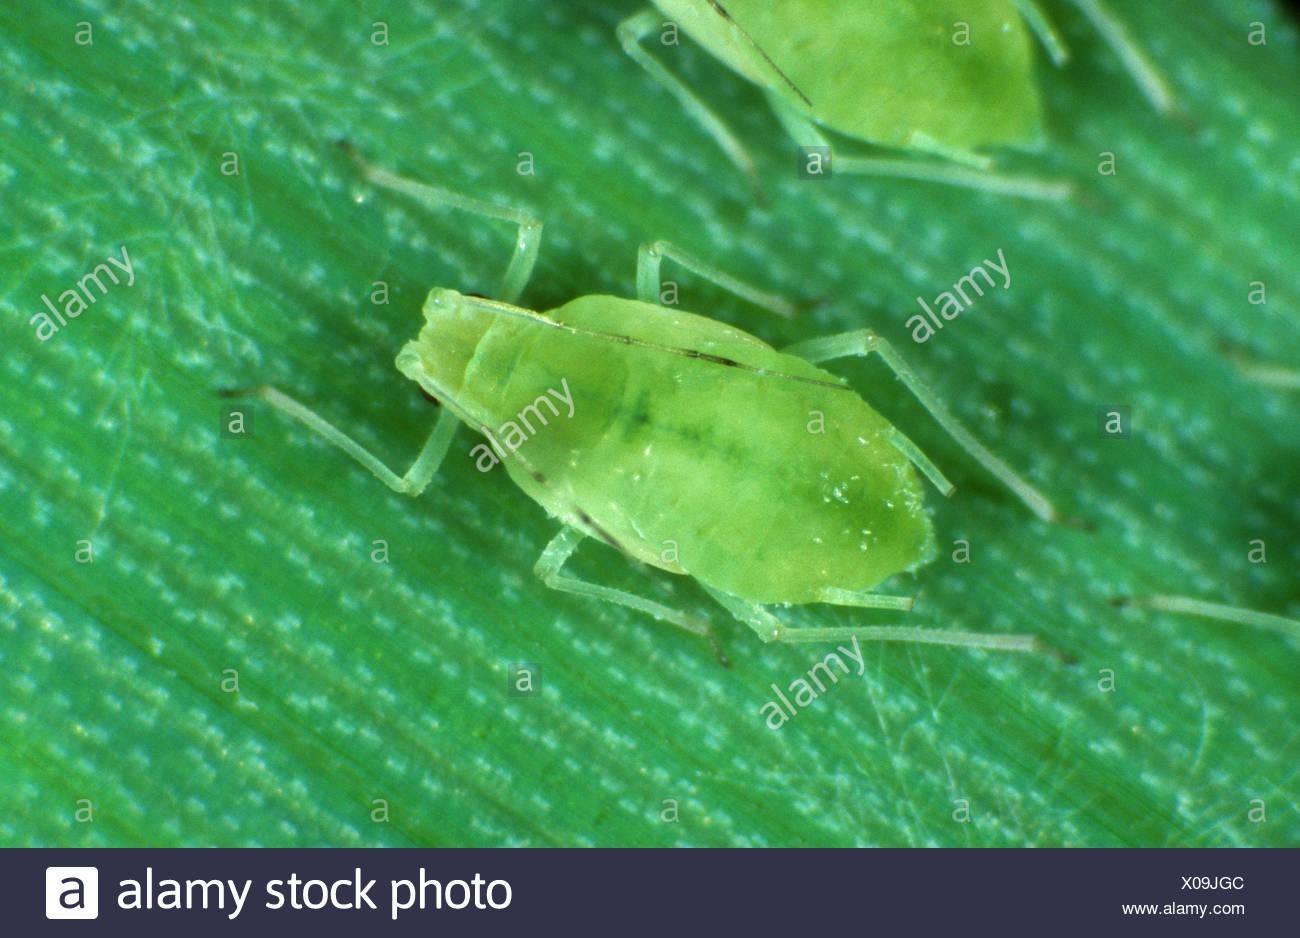 Rose-grain aphid (Metapolophium dirhodum) wingless female on a cereal leaf - Stock Image